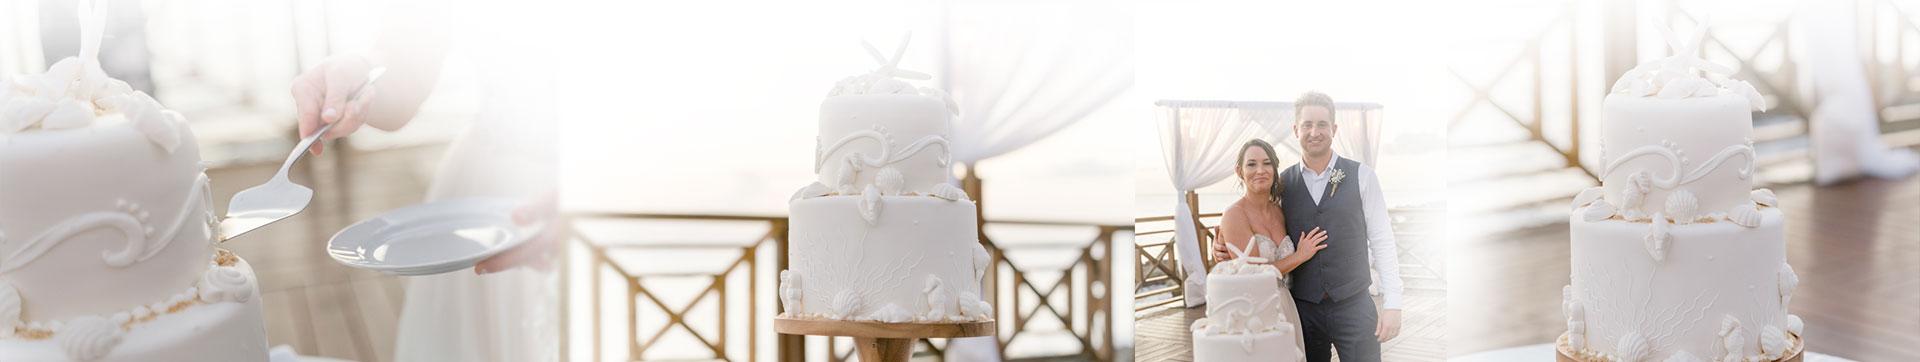 Wedding Cakes Gallery Banner - The Wharf Restaurant & Bar